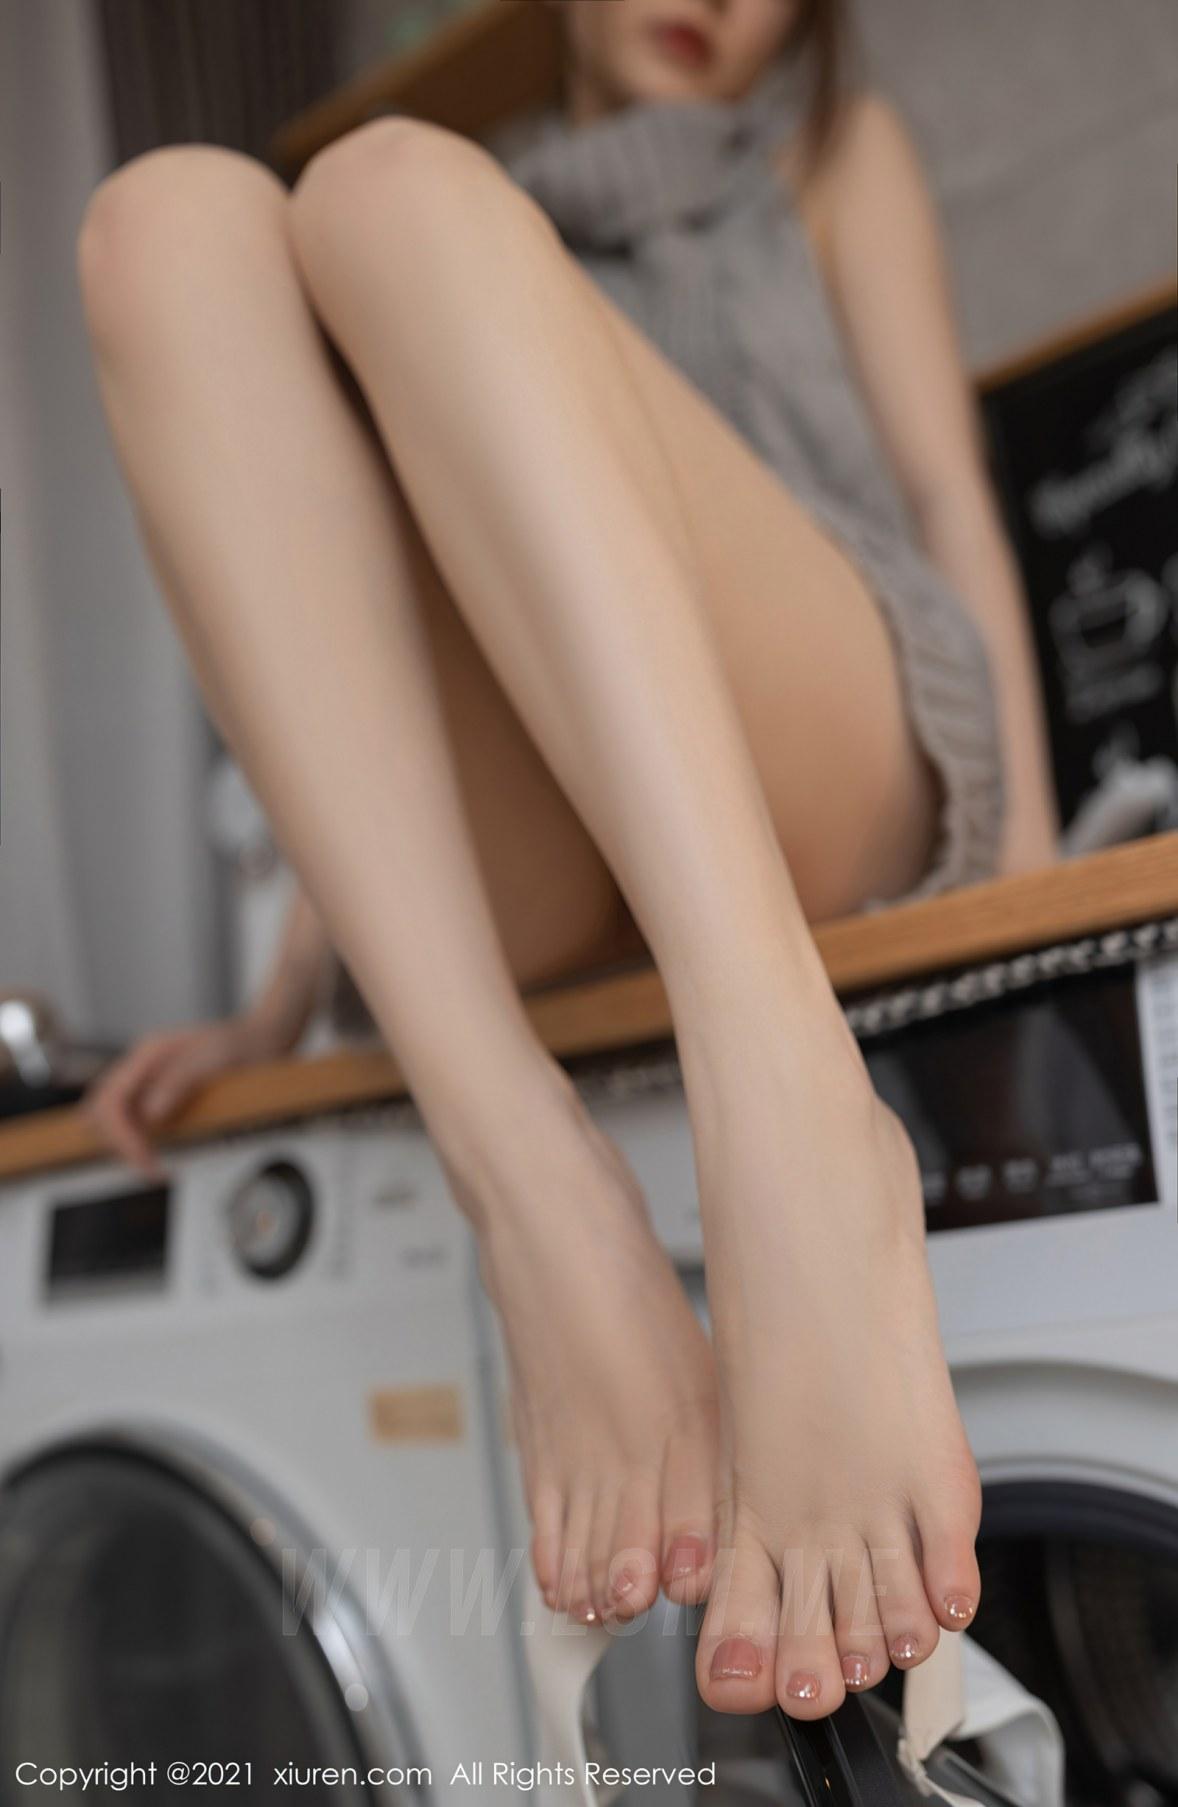 3620 047 bvr 3519 5400 - XiuRen 秀人 No.3620 洗衣机维修主题 鱼子酱Fish 性感写真111 - 秀人网 -【免费在线写真】【丽人丝语】